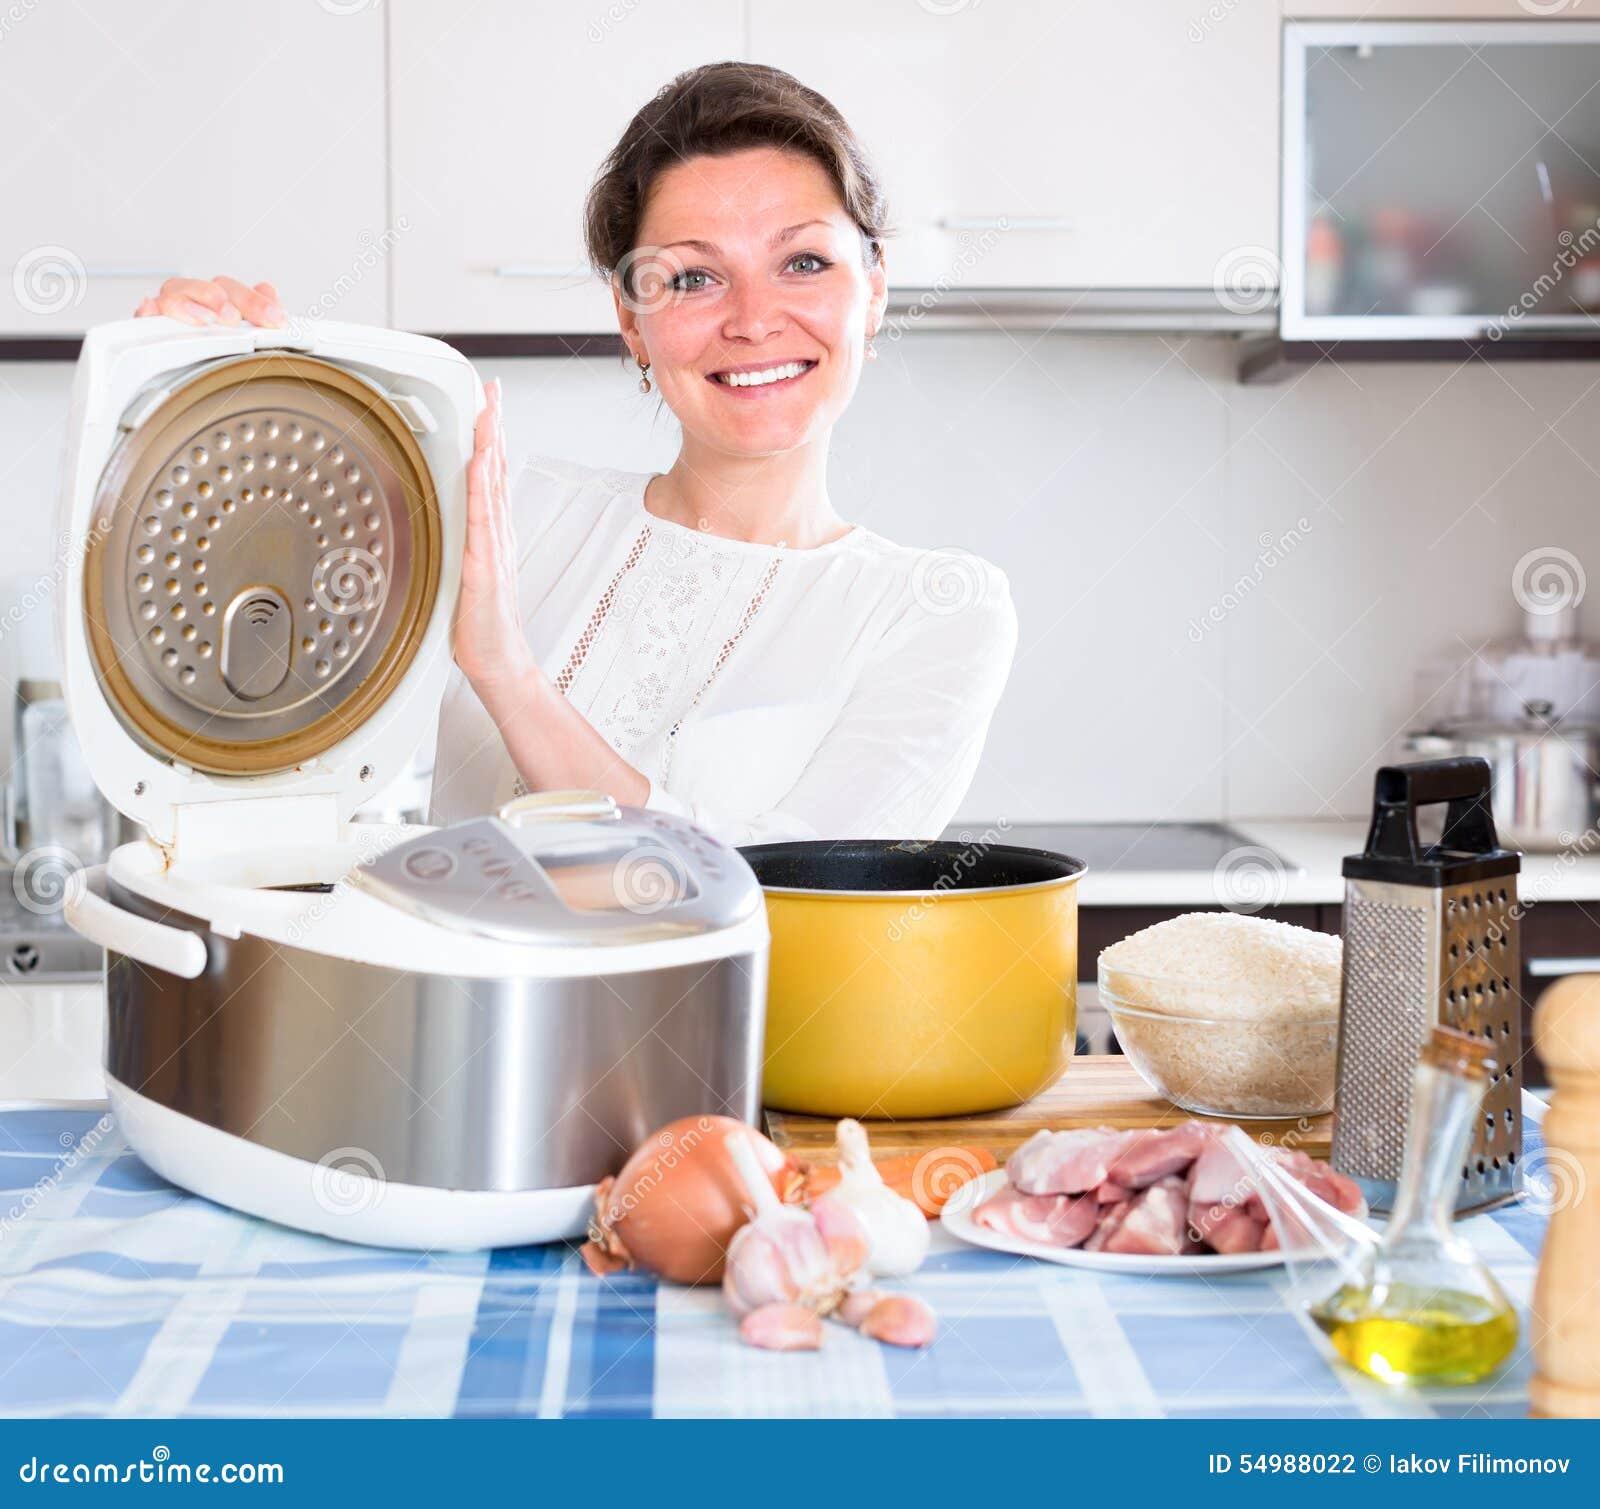 Huisvrouwen kokende rijst in multicooker